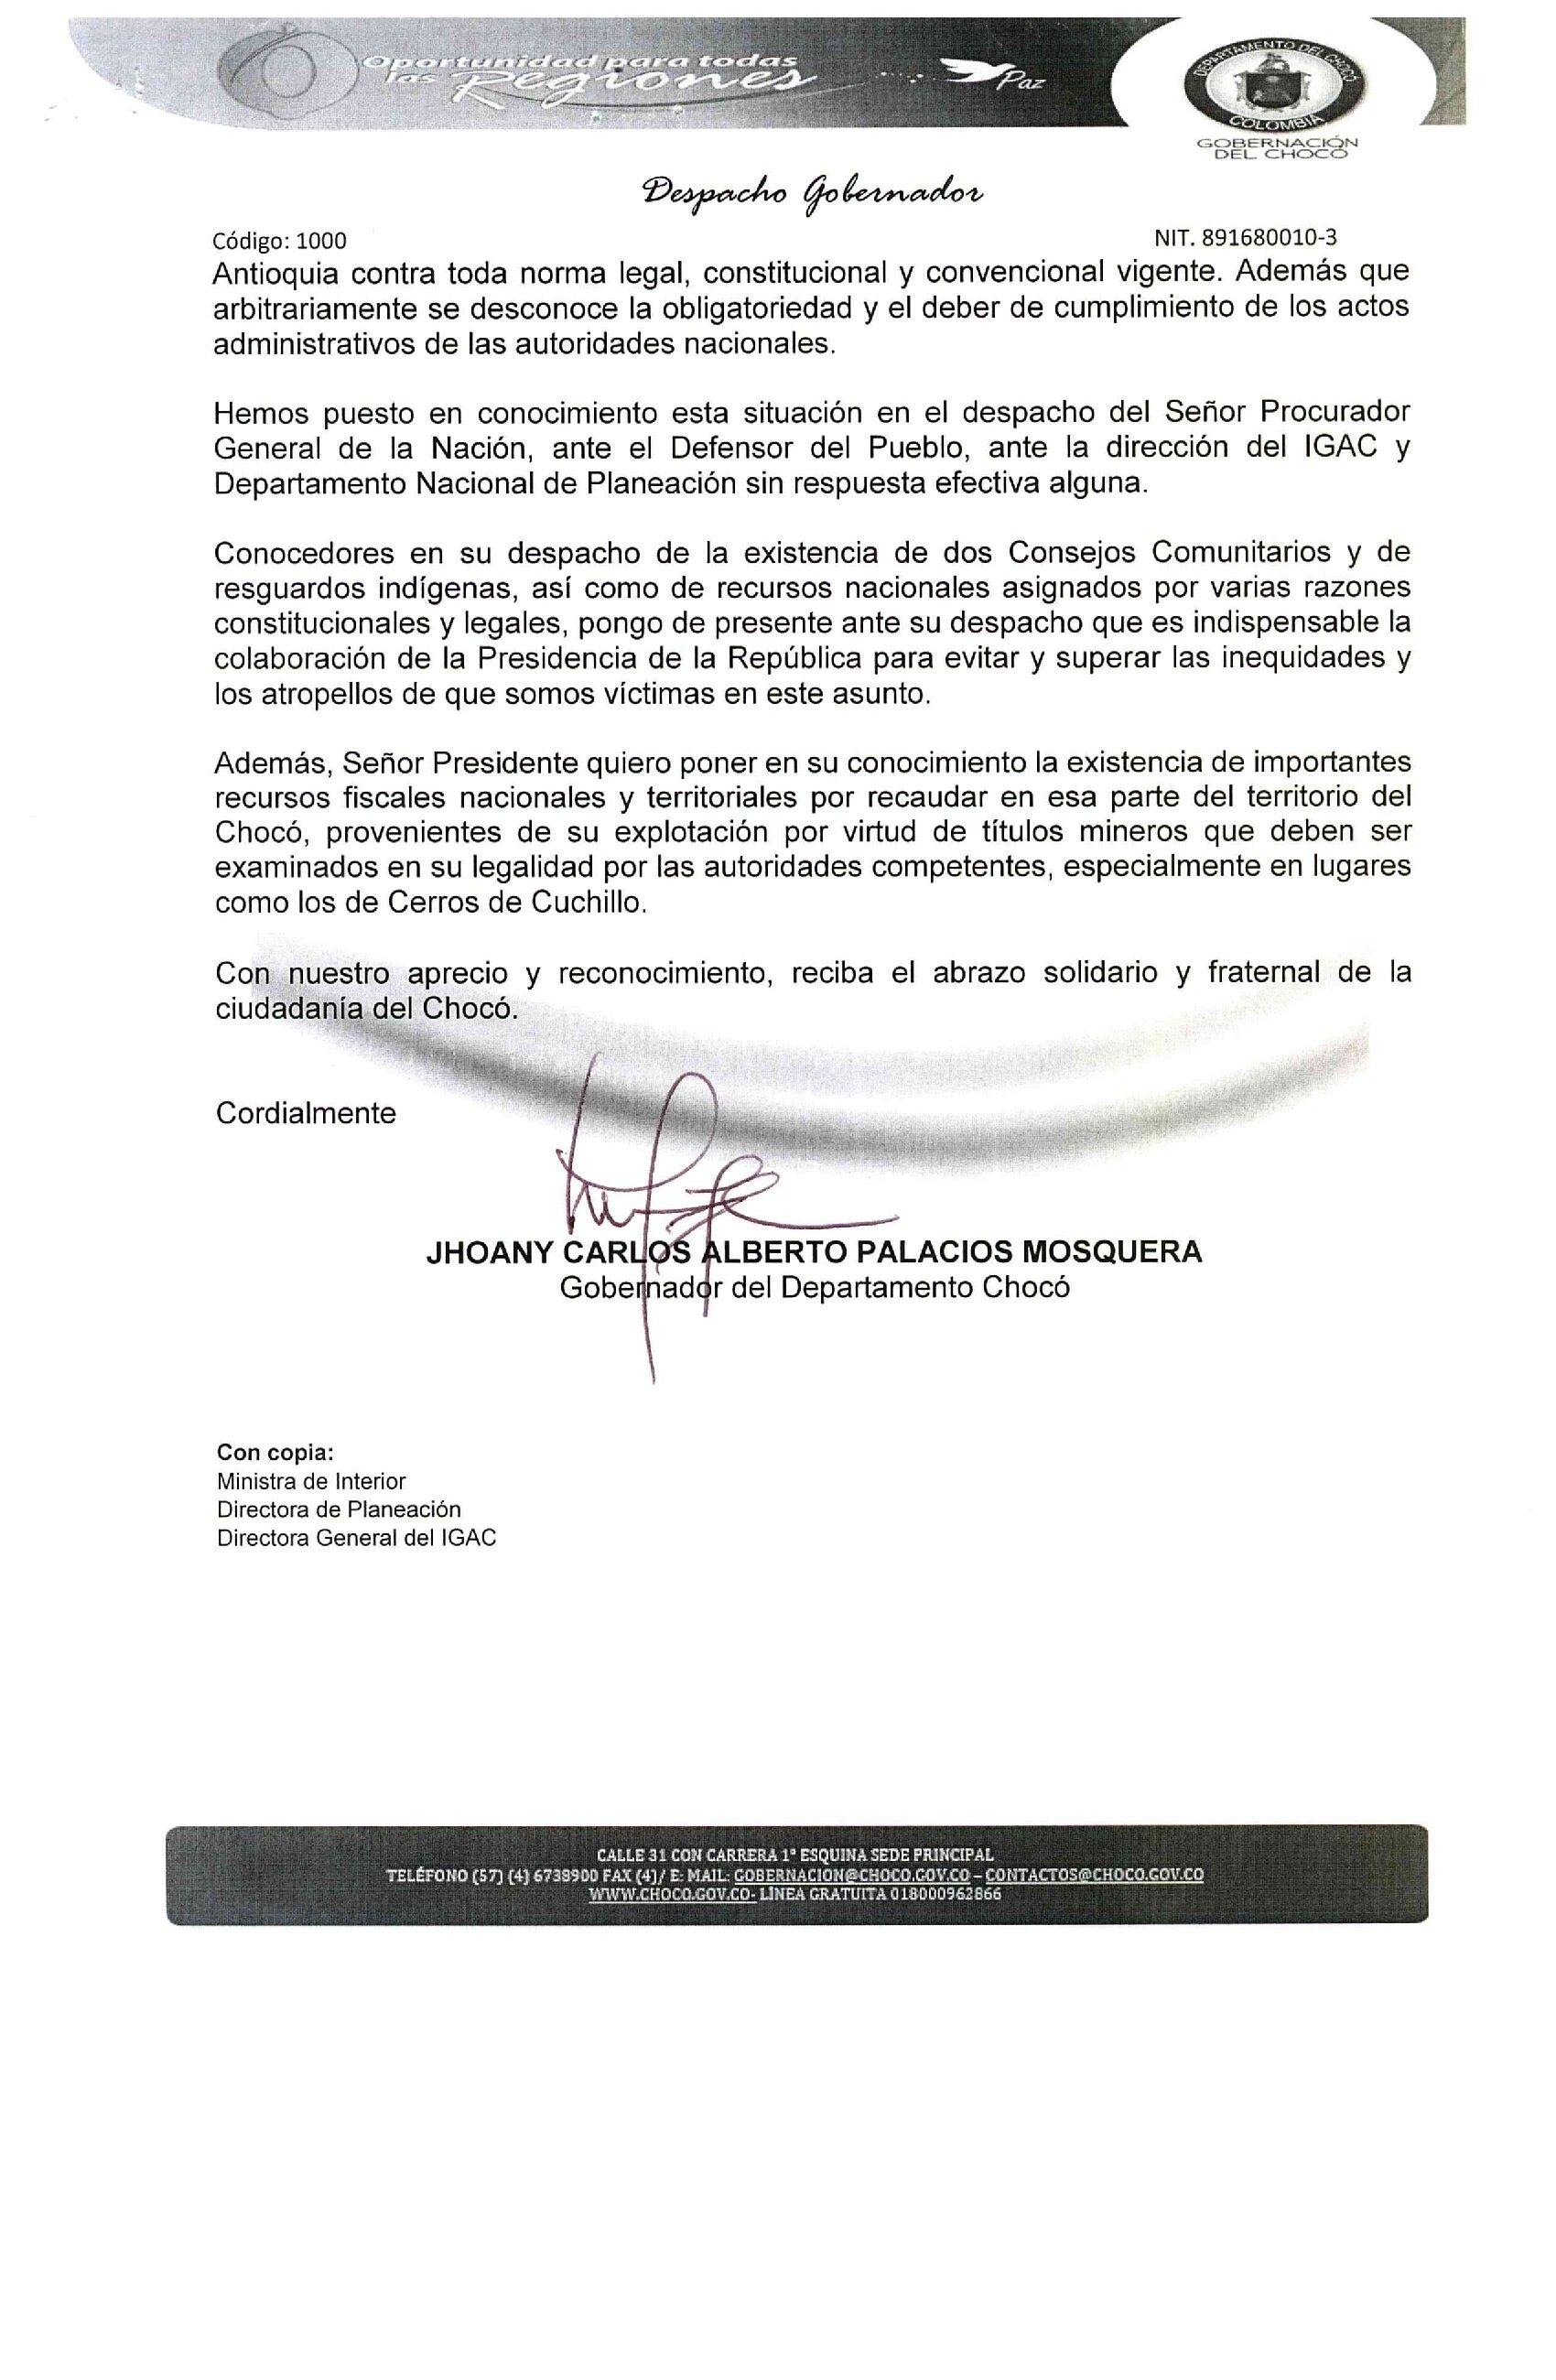 Carta del gobernador de Chocó al presidente Iván Duque.